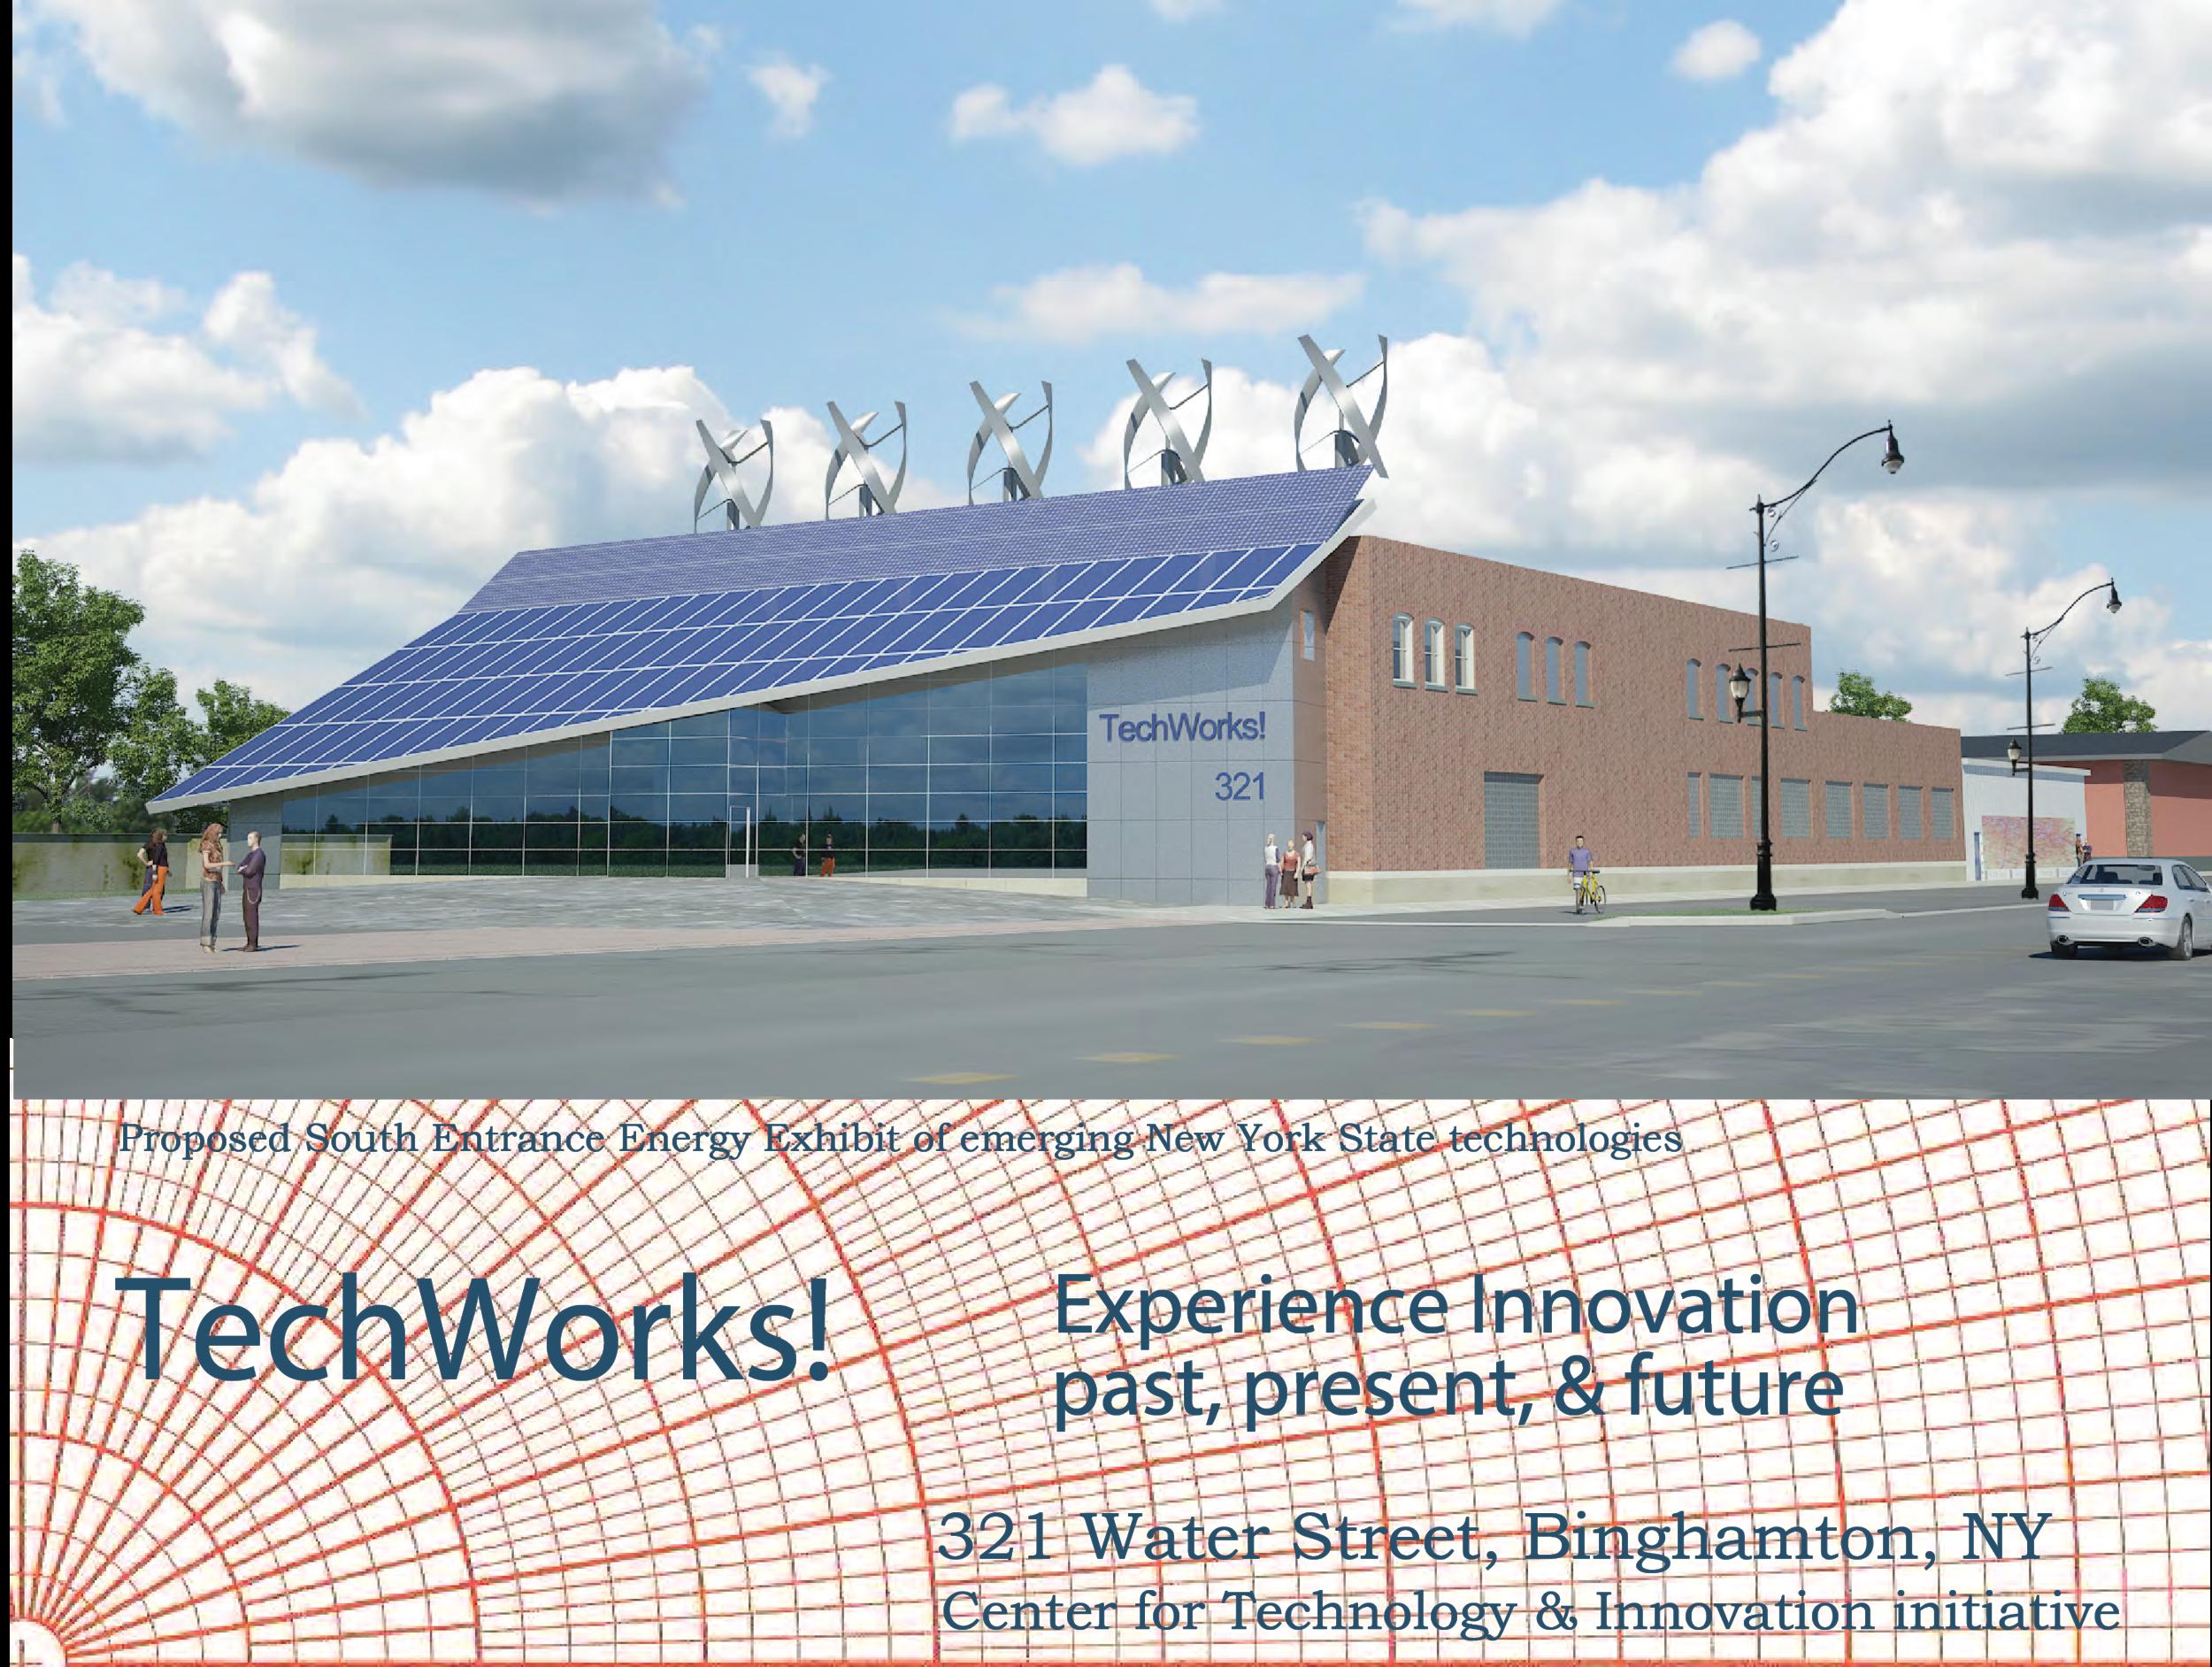 2015-01 TechWorks! South Entrance Energy Exhibit.png